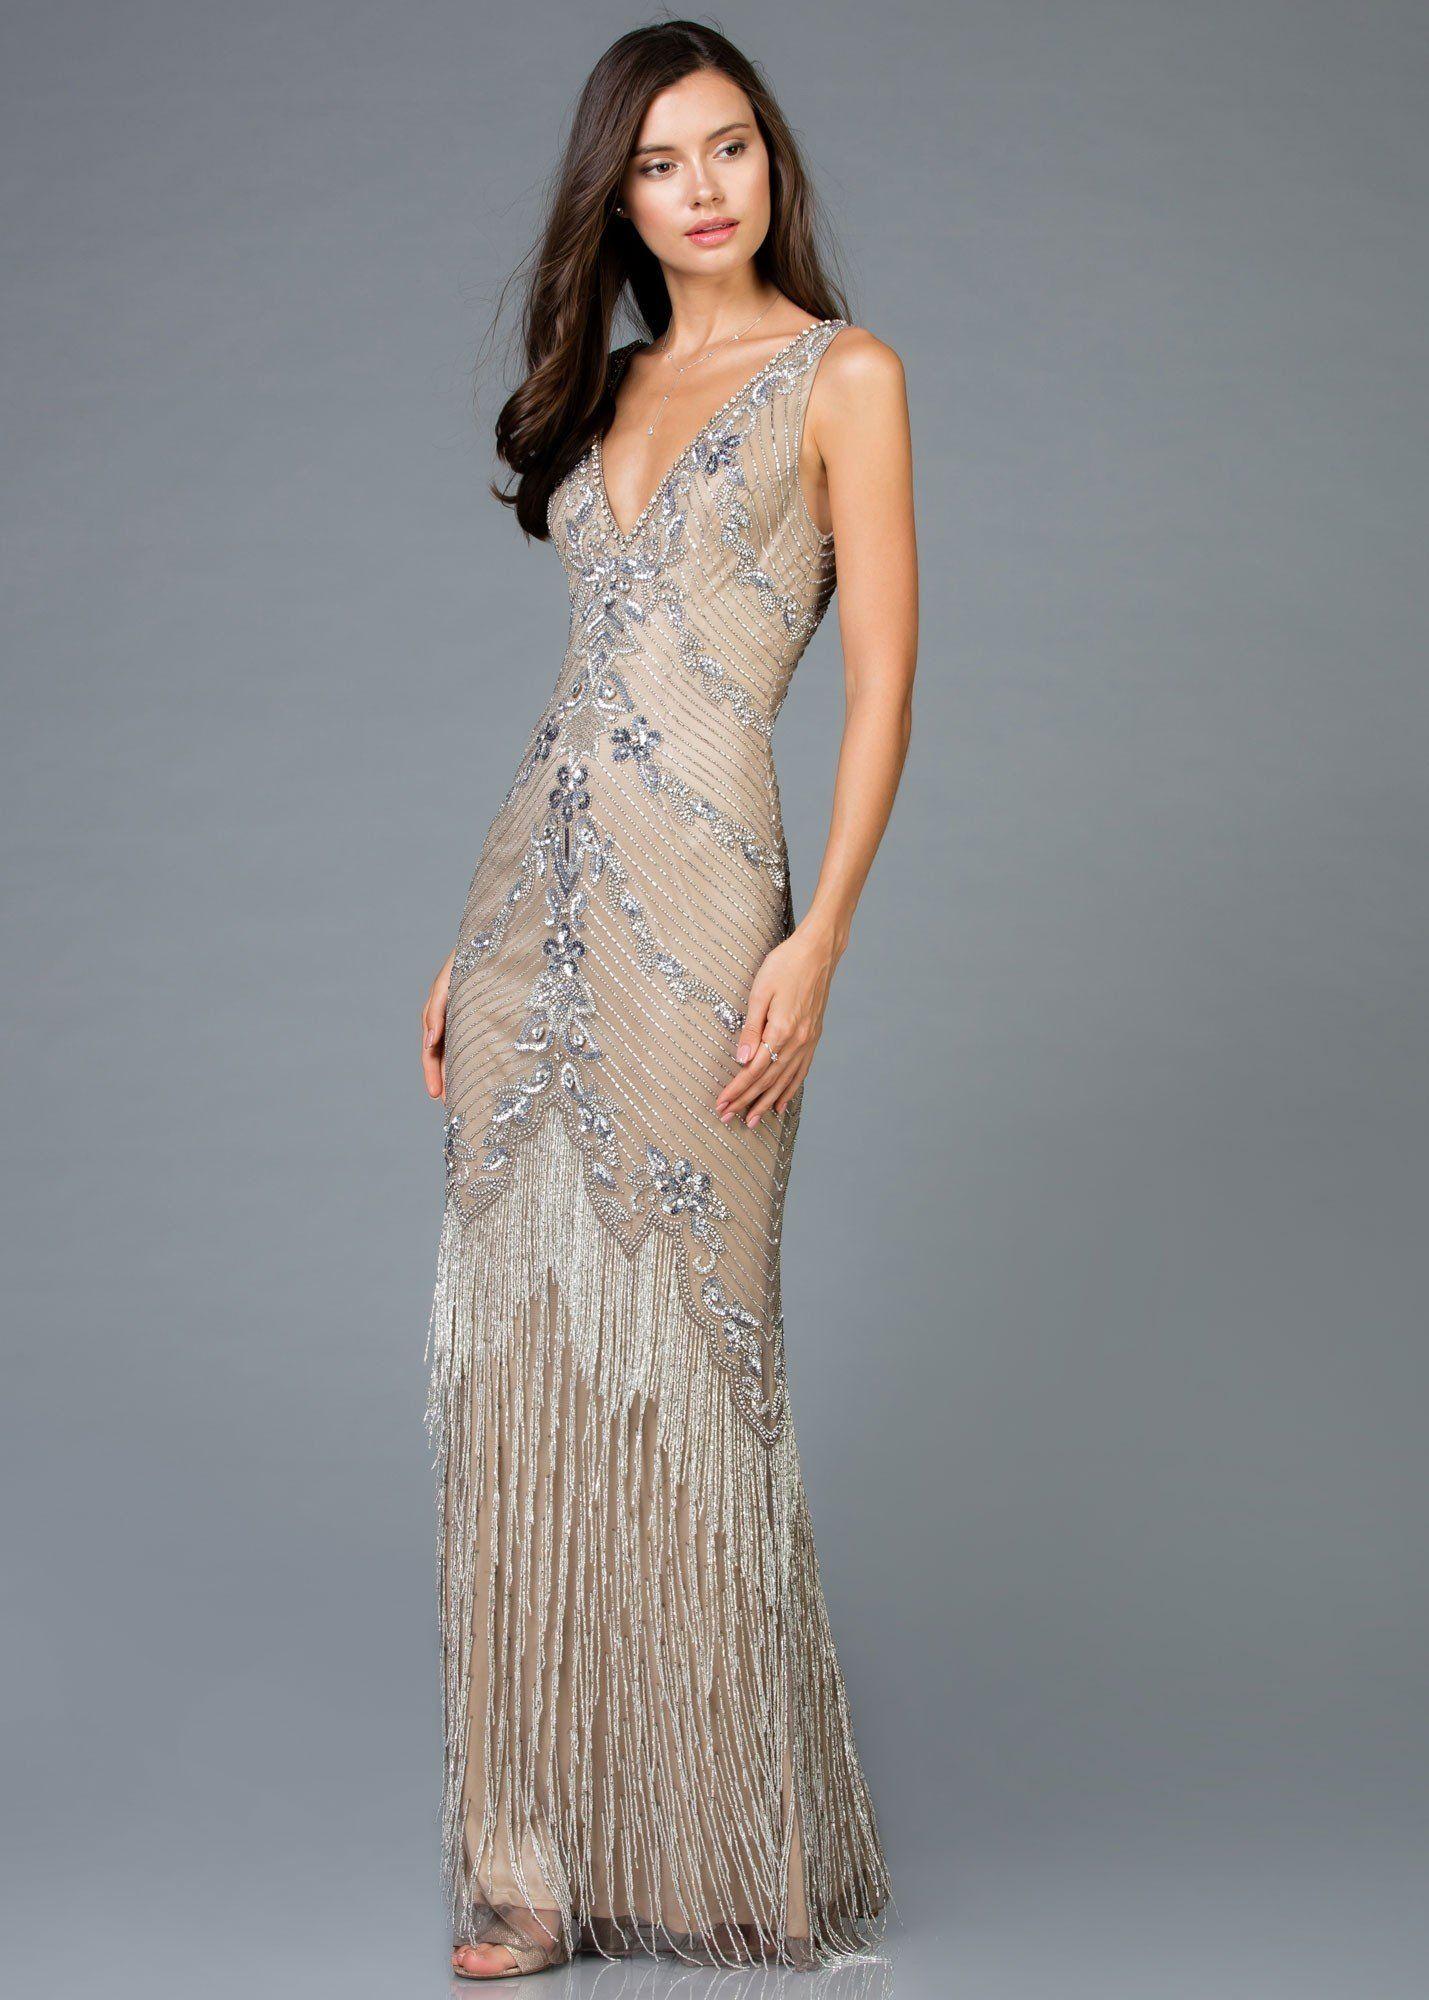 Scala 48951 Glam Fringe Evening Gown Beaded Evening Gowns Chic Evening Dress Evening Dresses [ 2000 x 1429 Pixel ]